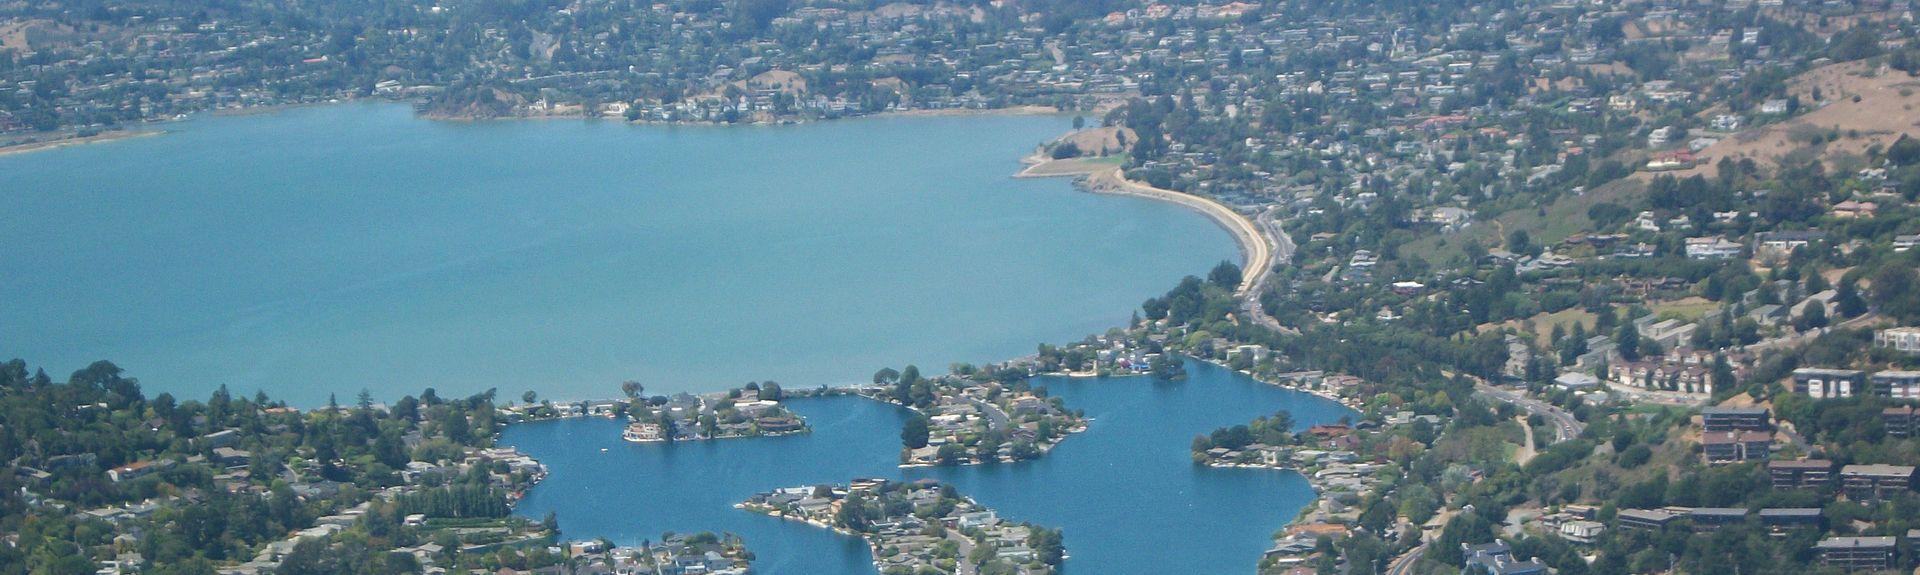 Belvedere, Tiburon, Califórnia, Estados Unidos